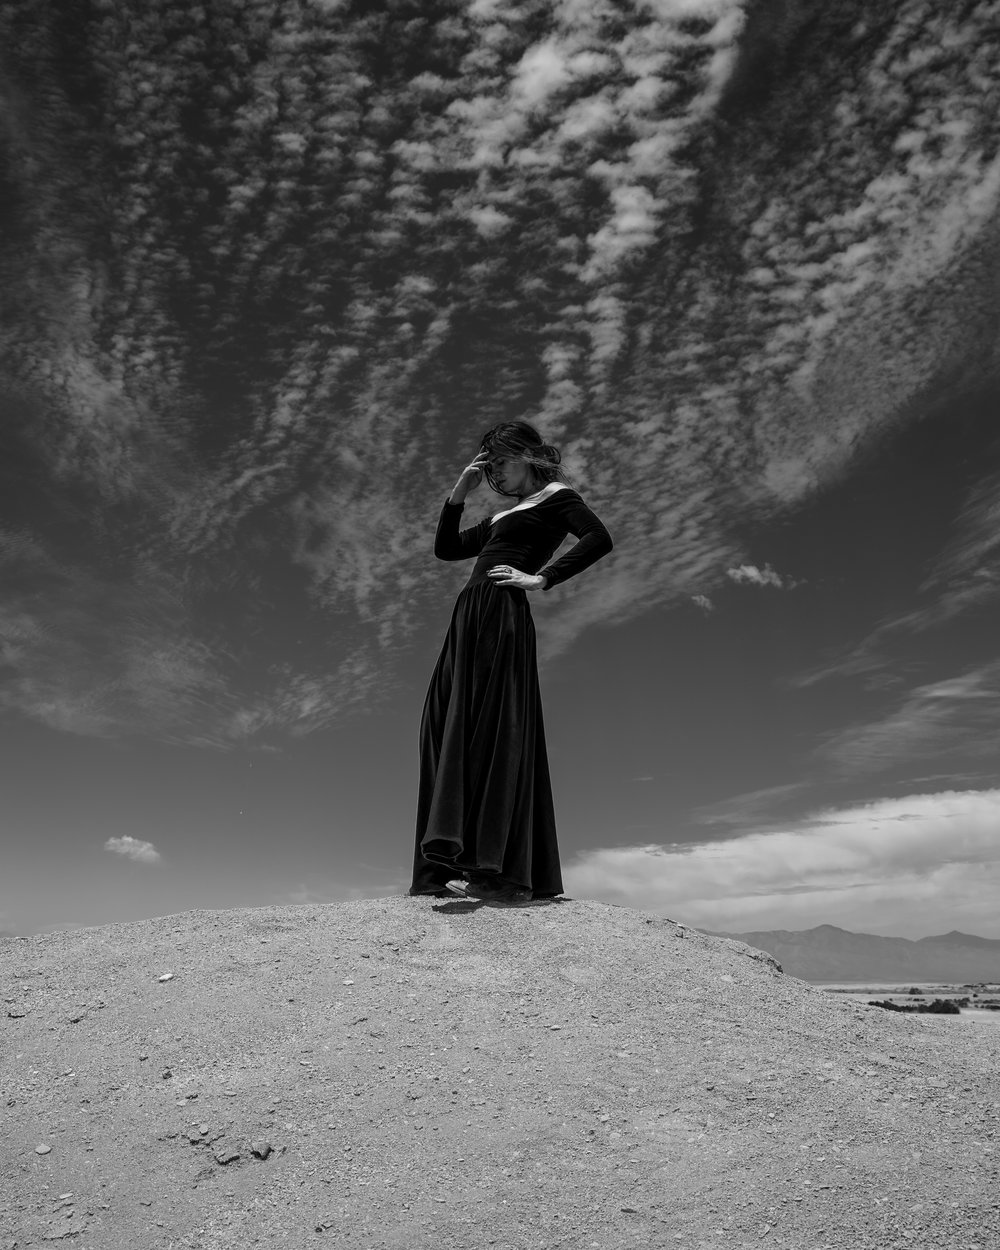 Photo by Damon James Duke